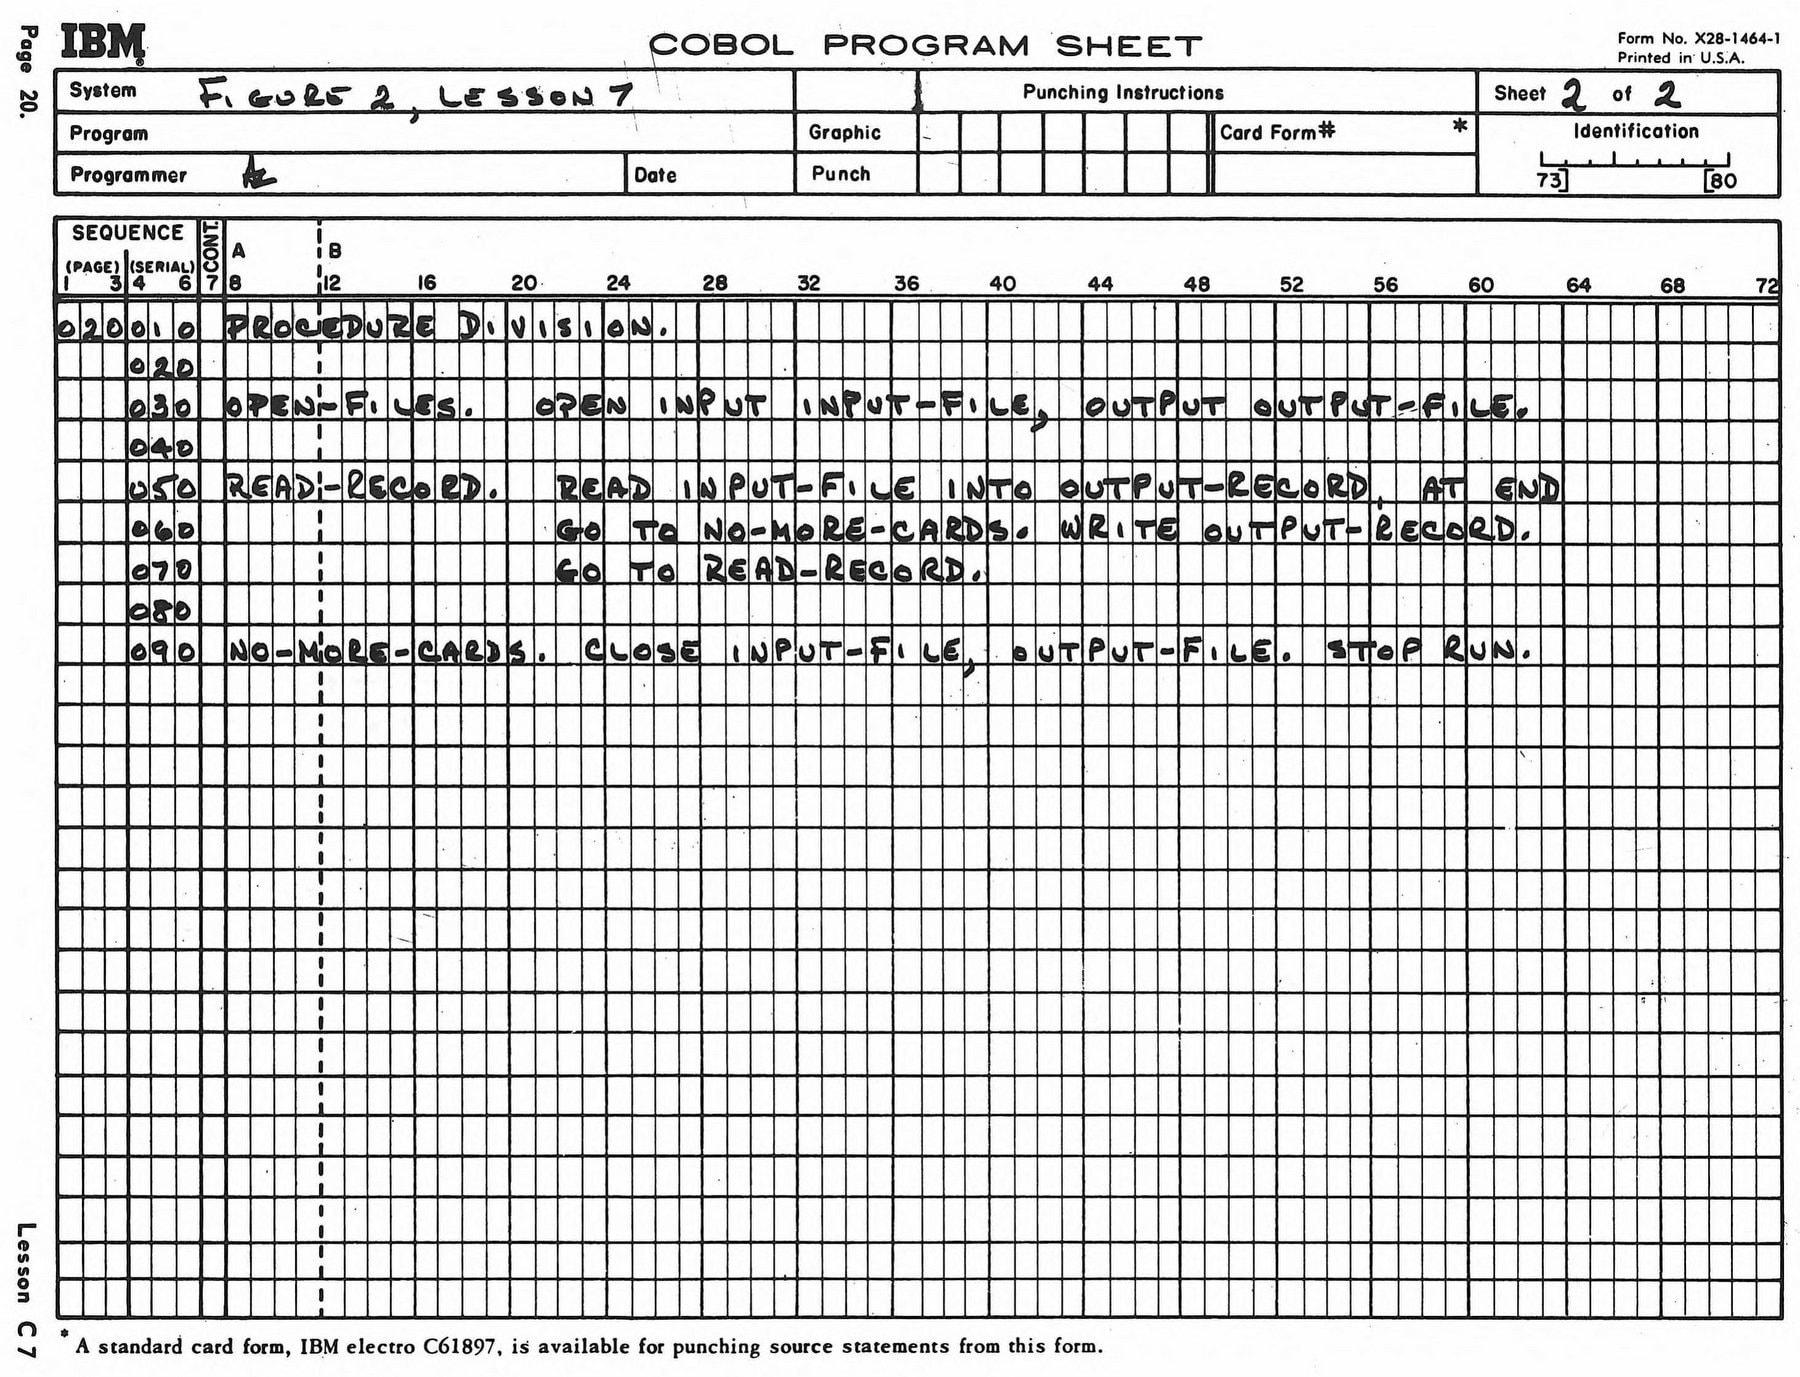 Vintage 60s COBOL computer programming sheets (2)